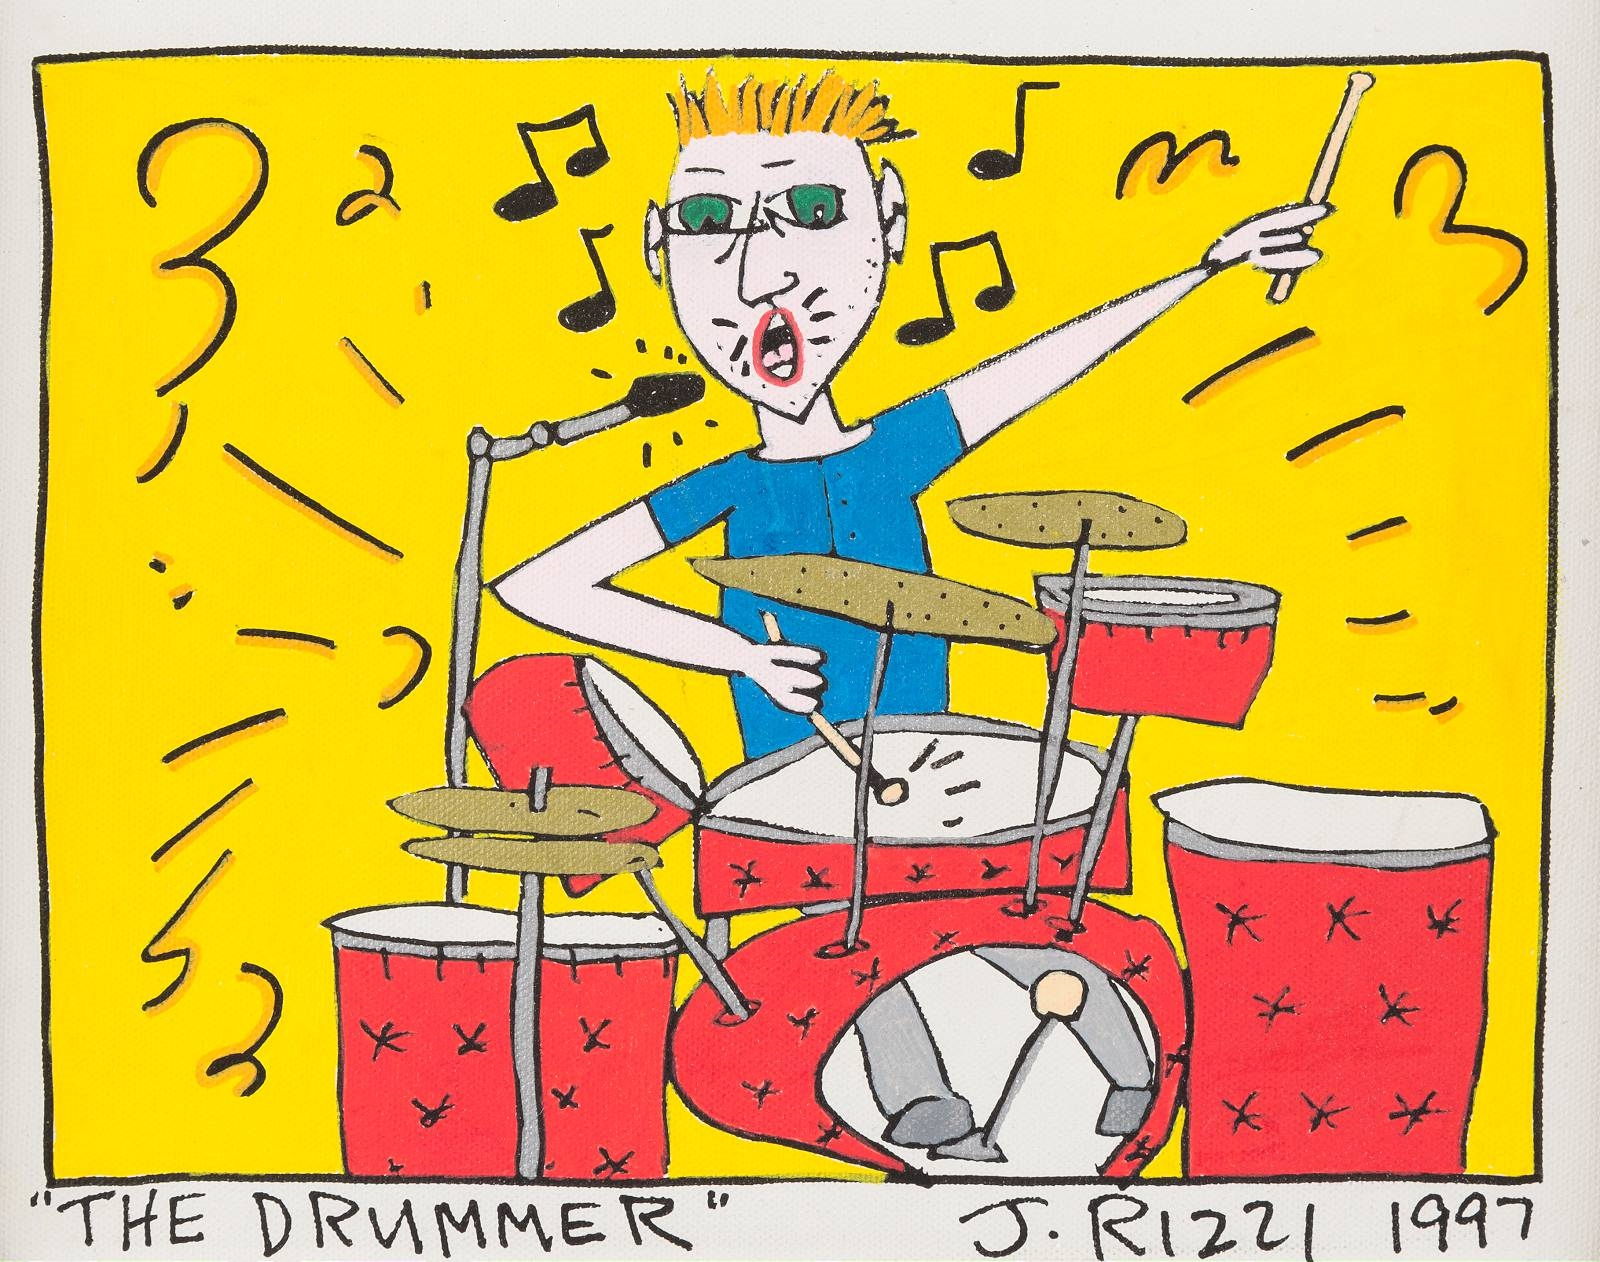 james rizzi  the drummer 1997  mutualart